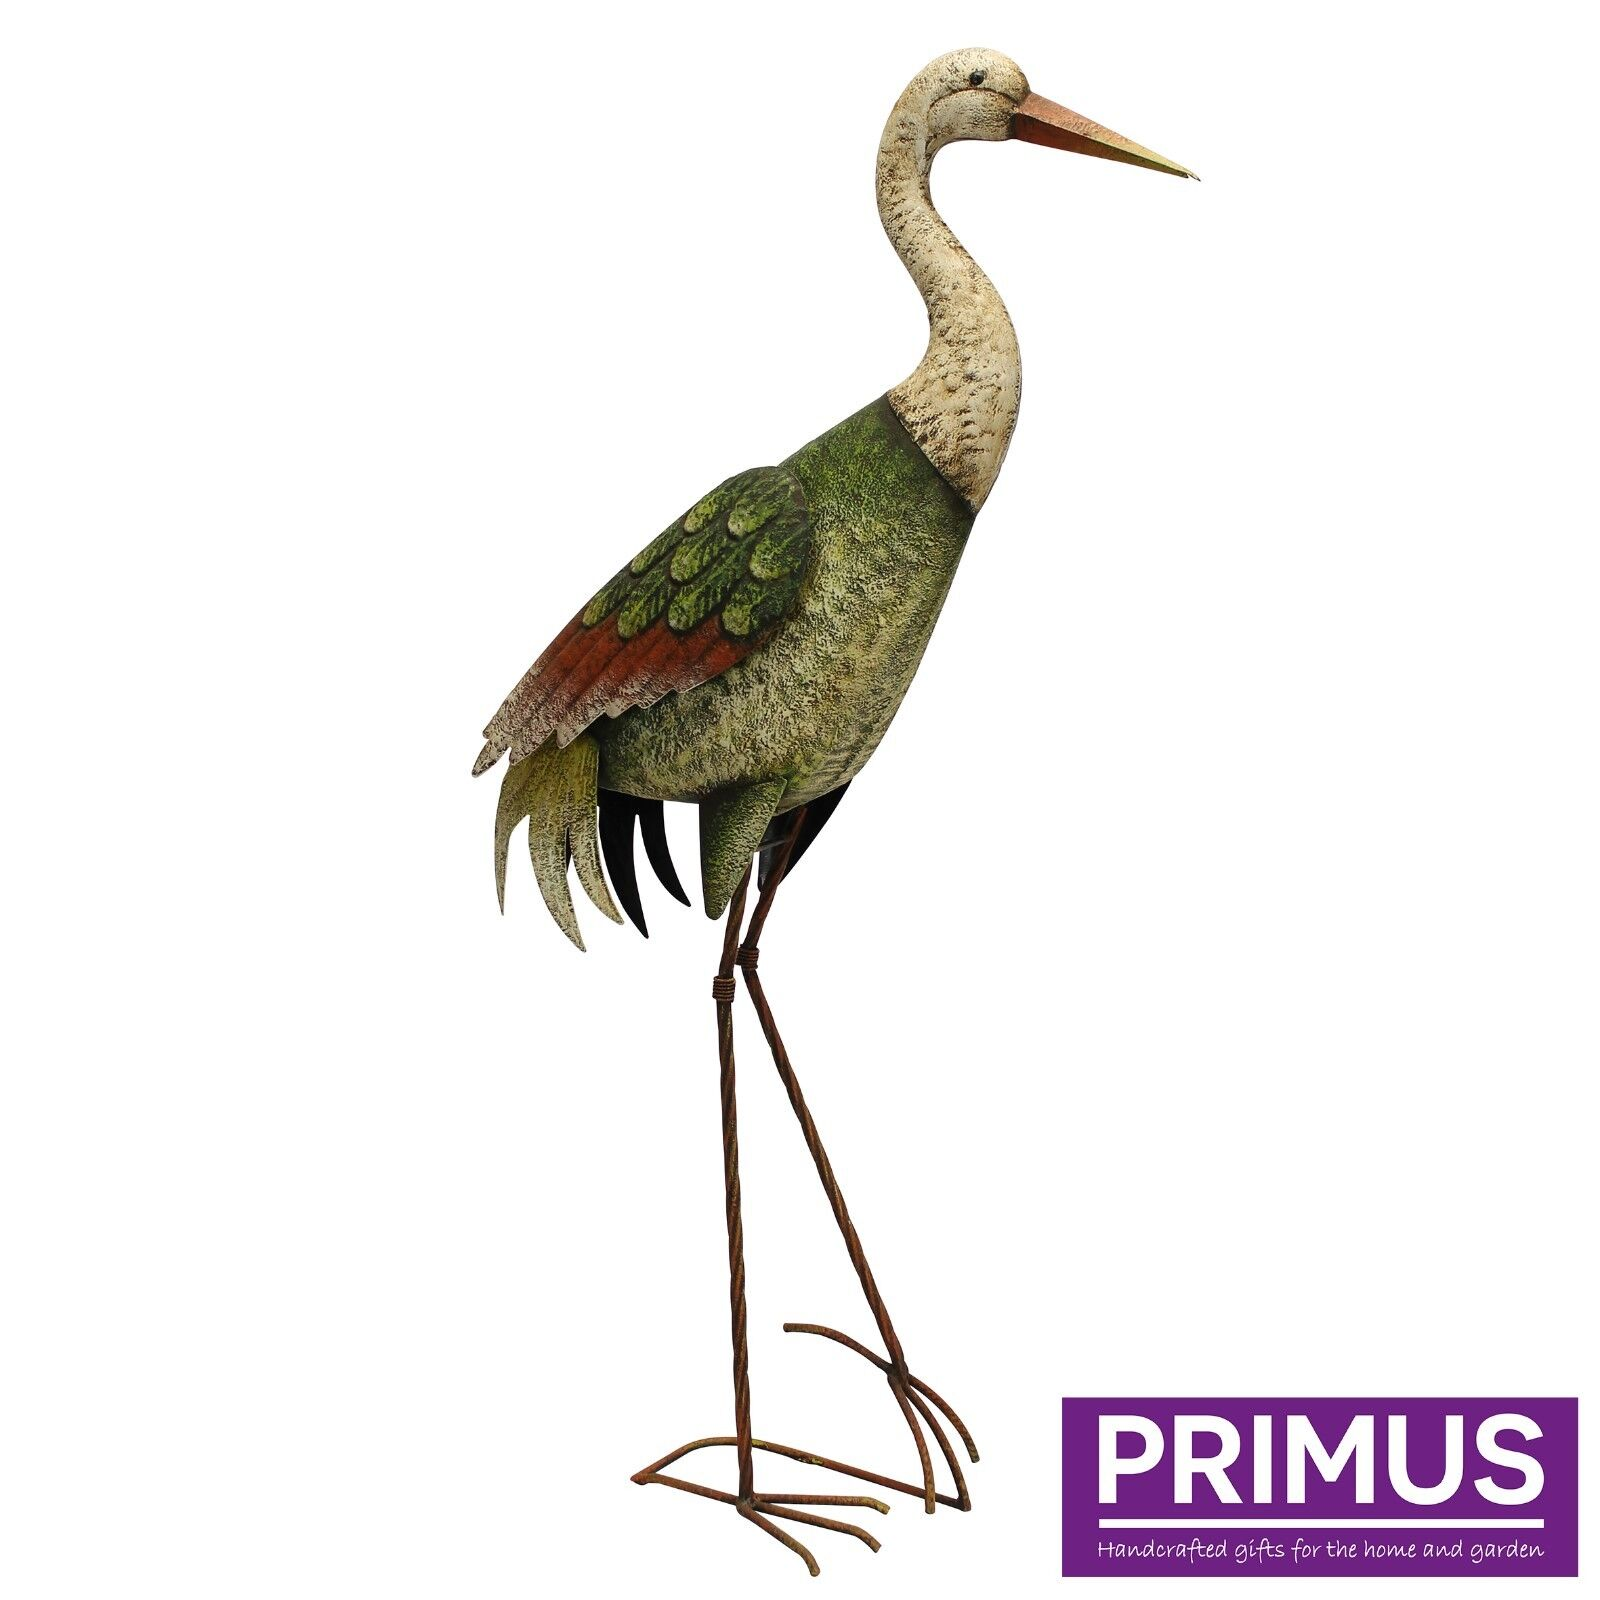 Primus Rural Metal Stork Garden Ornament Sculpture